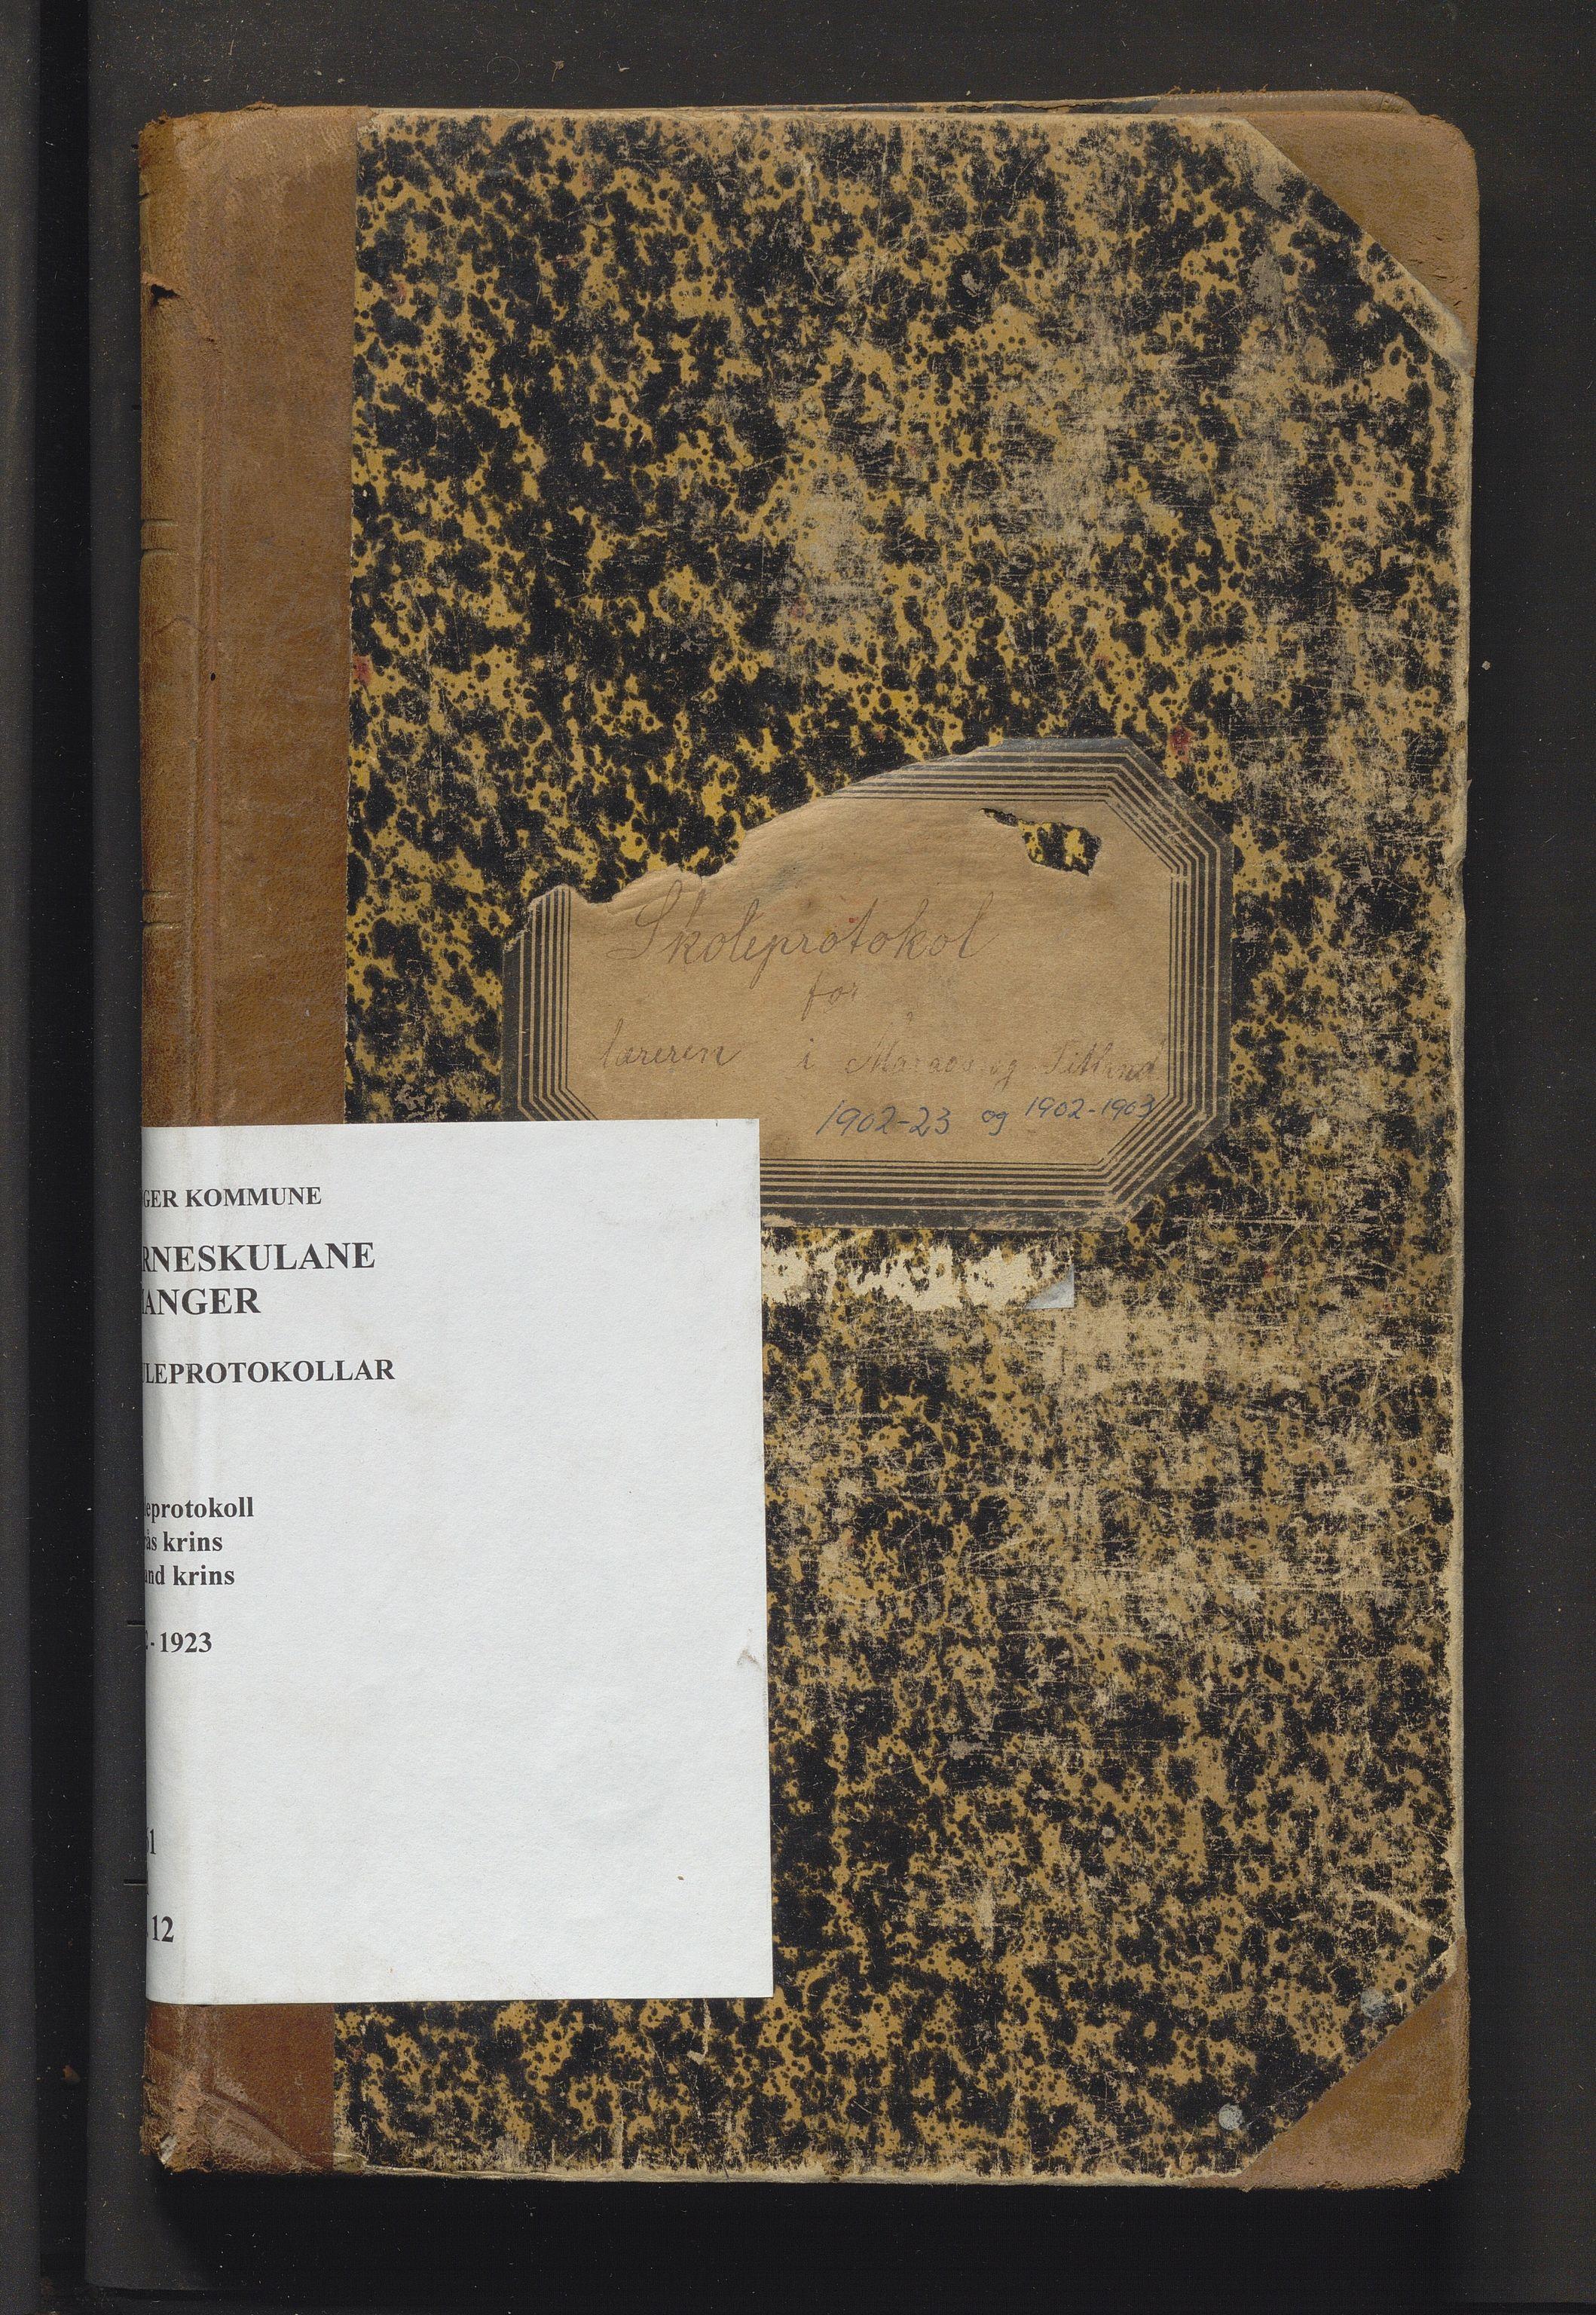 IKAH, Manger kommune. Barneskulane, F/Fa/L0012: Skuleprotokoll for Marås og Titland krinsar , 1902-1923